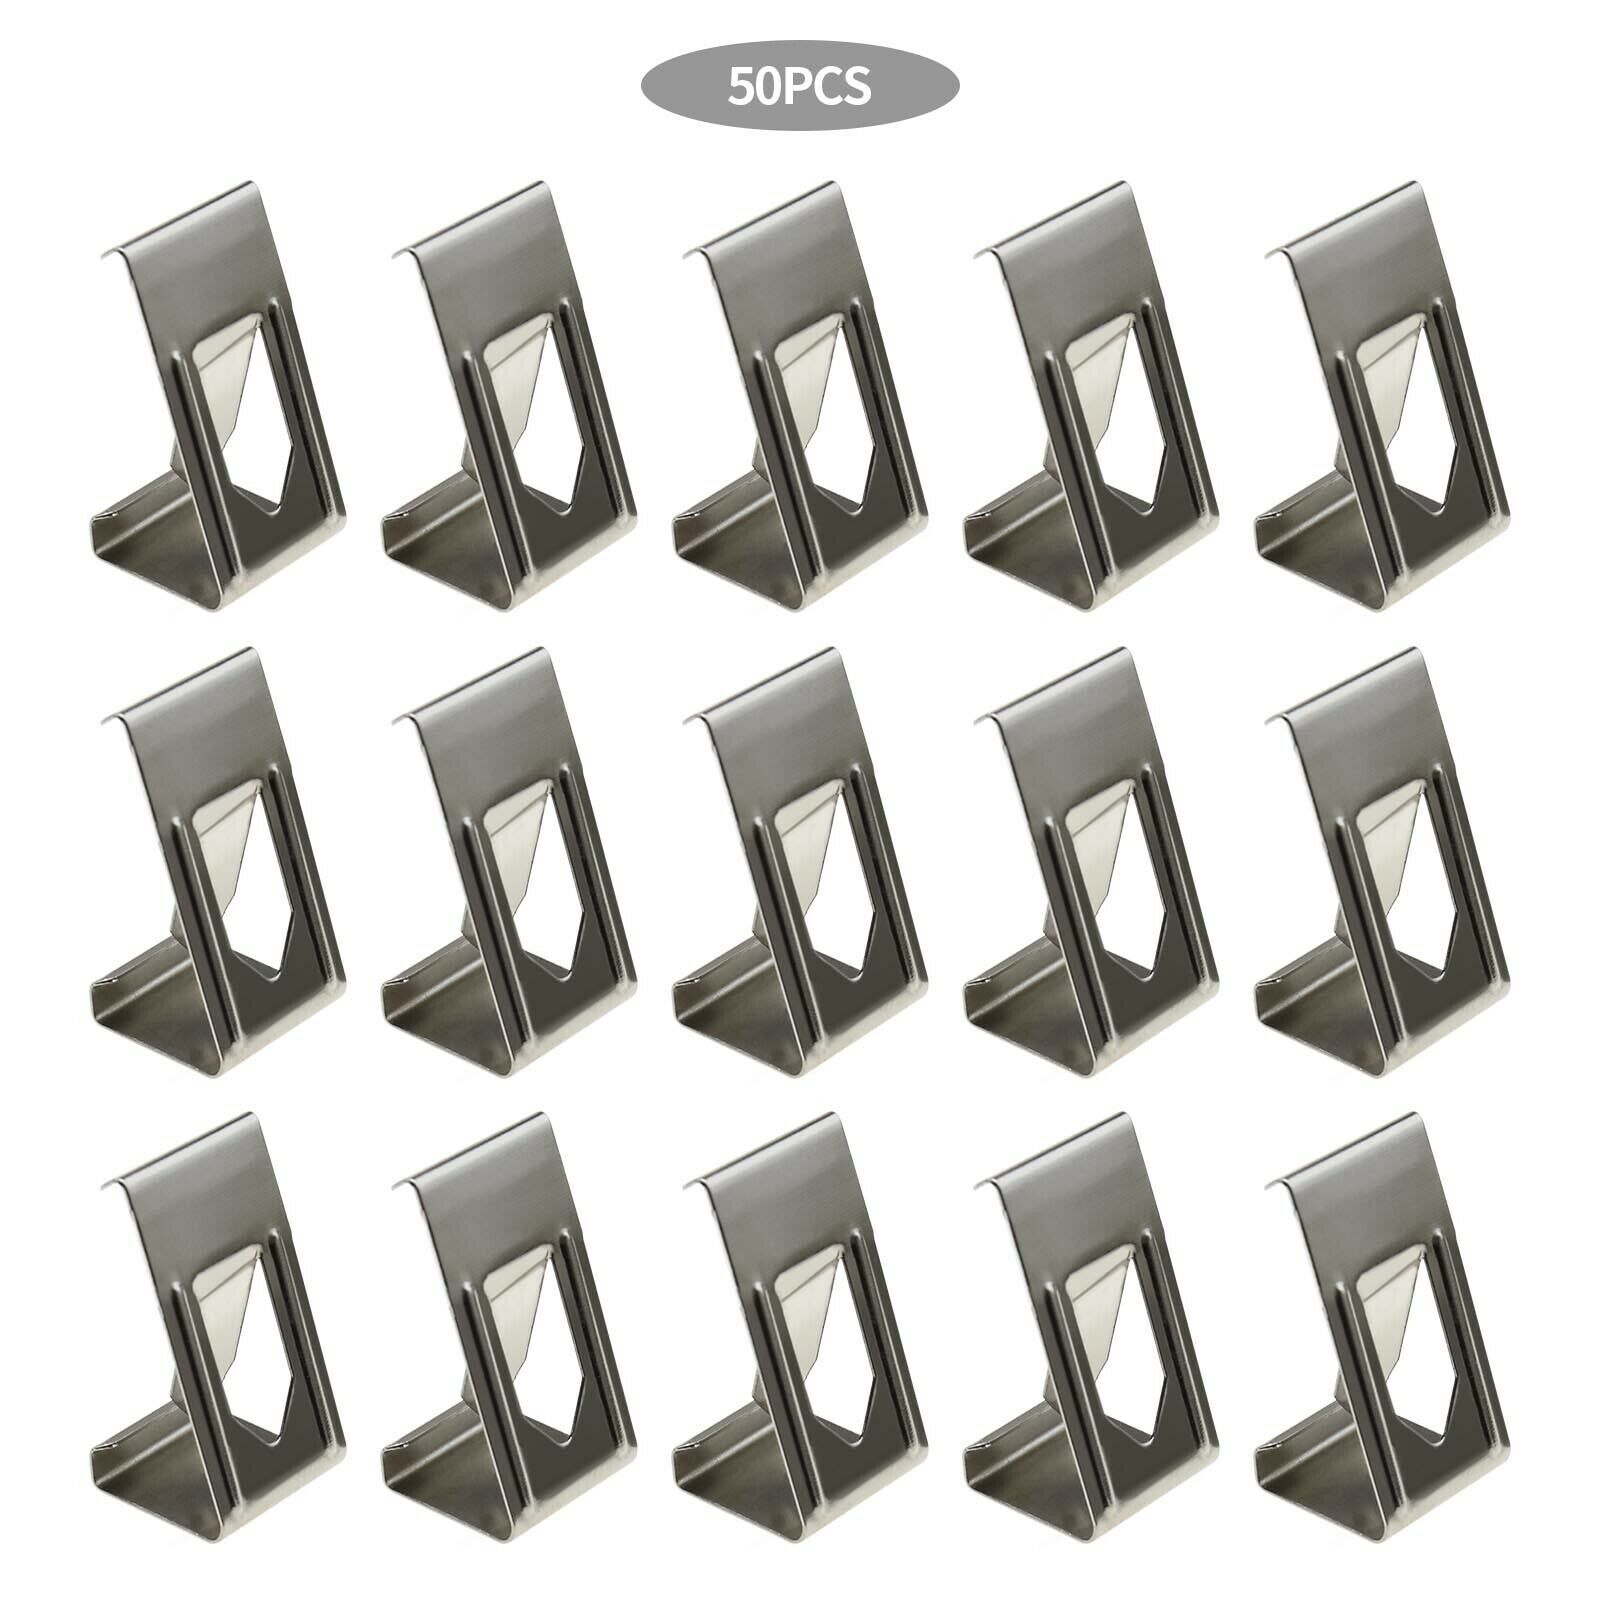 Silver Metal Spring Turn Clip Hanger For Frame 3D Printer Heated Bed 50Pcs